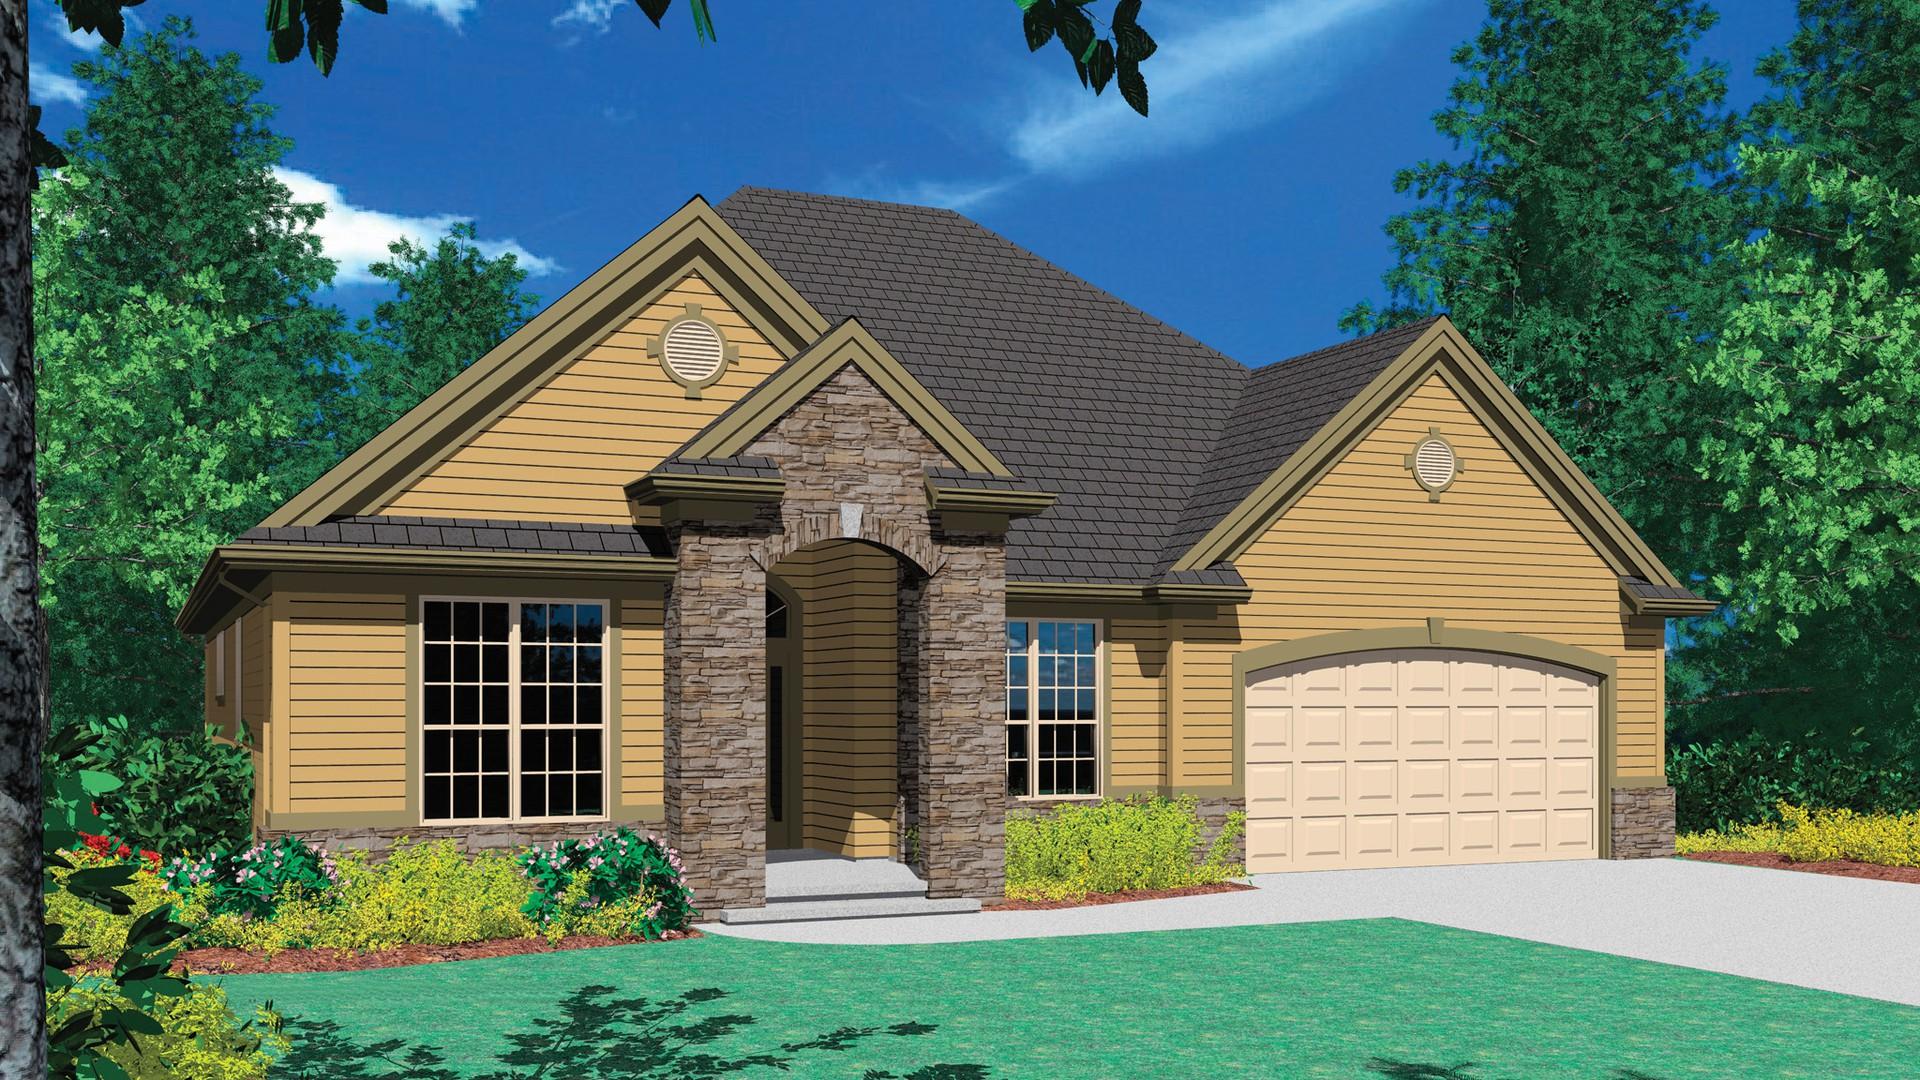 Craftsman House Plan 1146a The Reagan 1580 Sqft 3 Bedrooms 2 1 Bathrooms